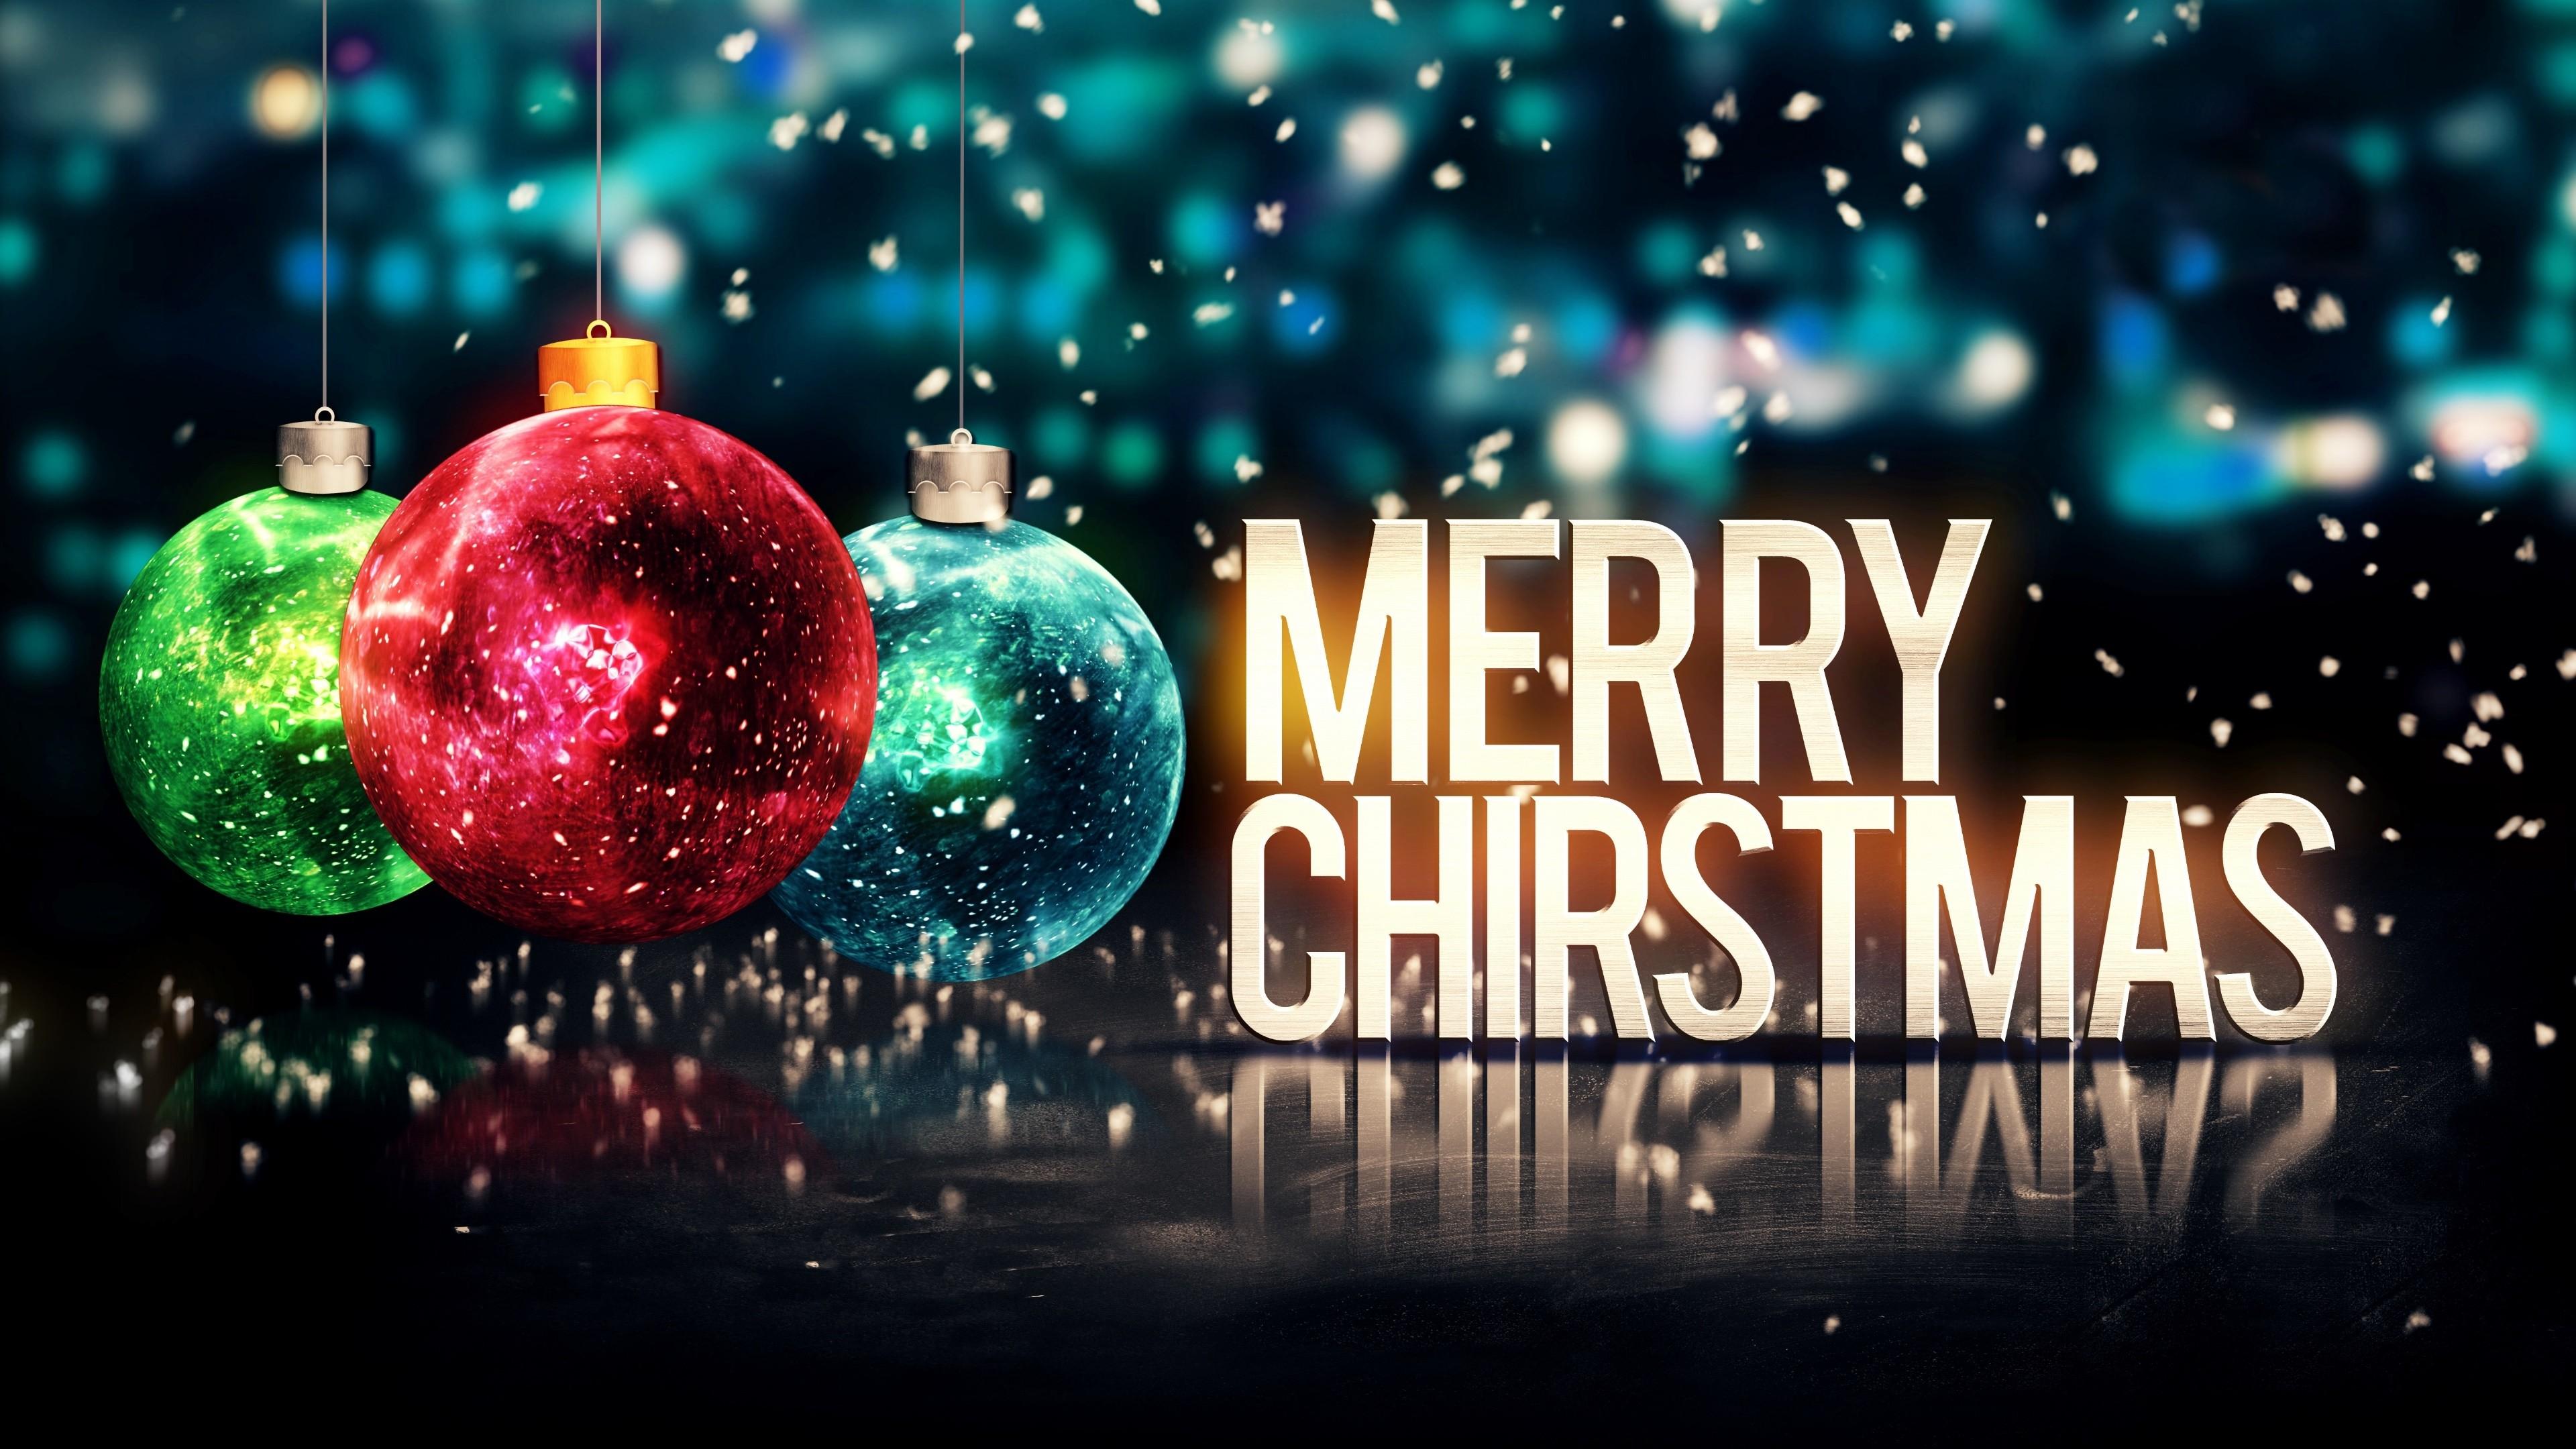 Christmas Desktop Pictures.Merry Christmas Backgrounds Desktop Wallpapertag